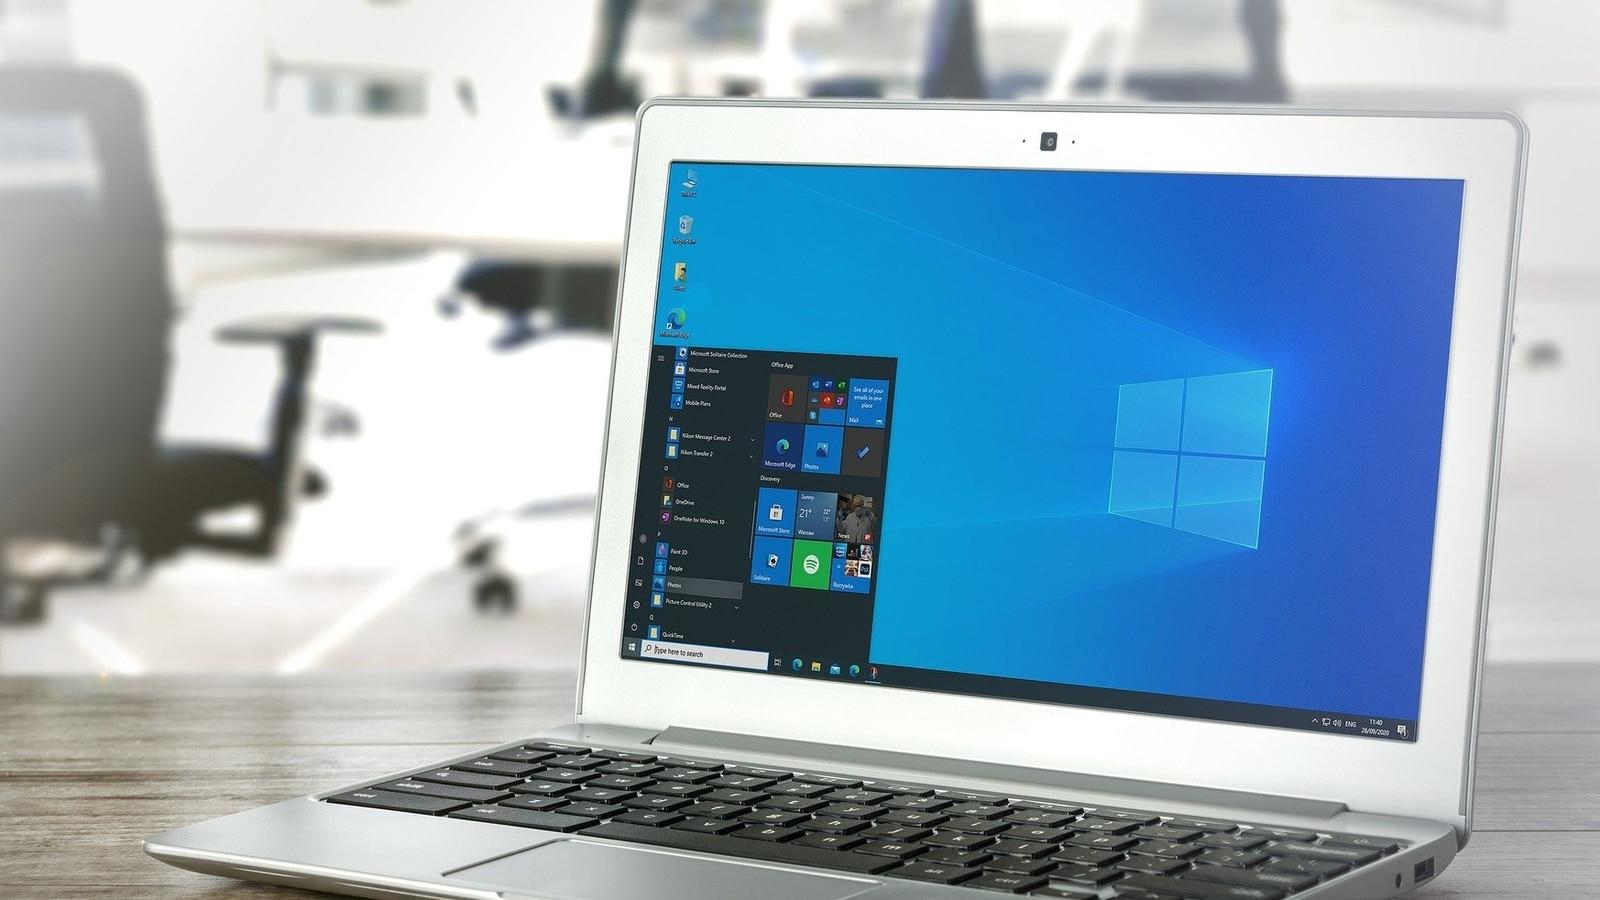 Windows 10 update finally fixes taskbar visual problems, fixes bugs that slowed down games